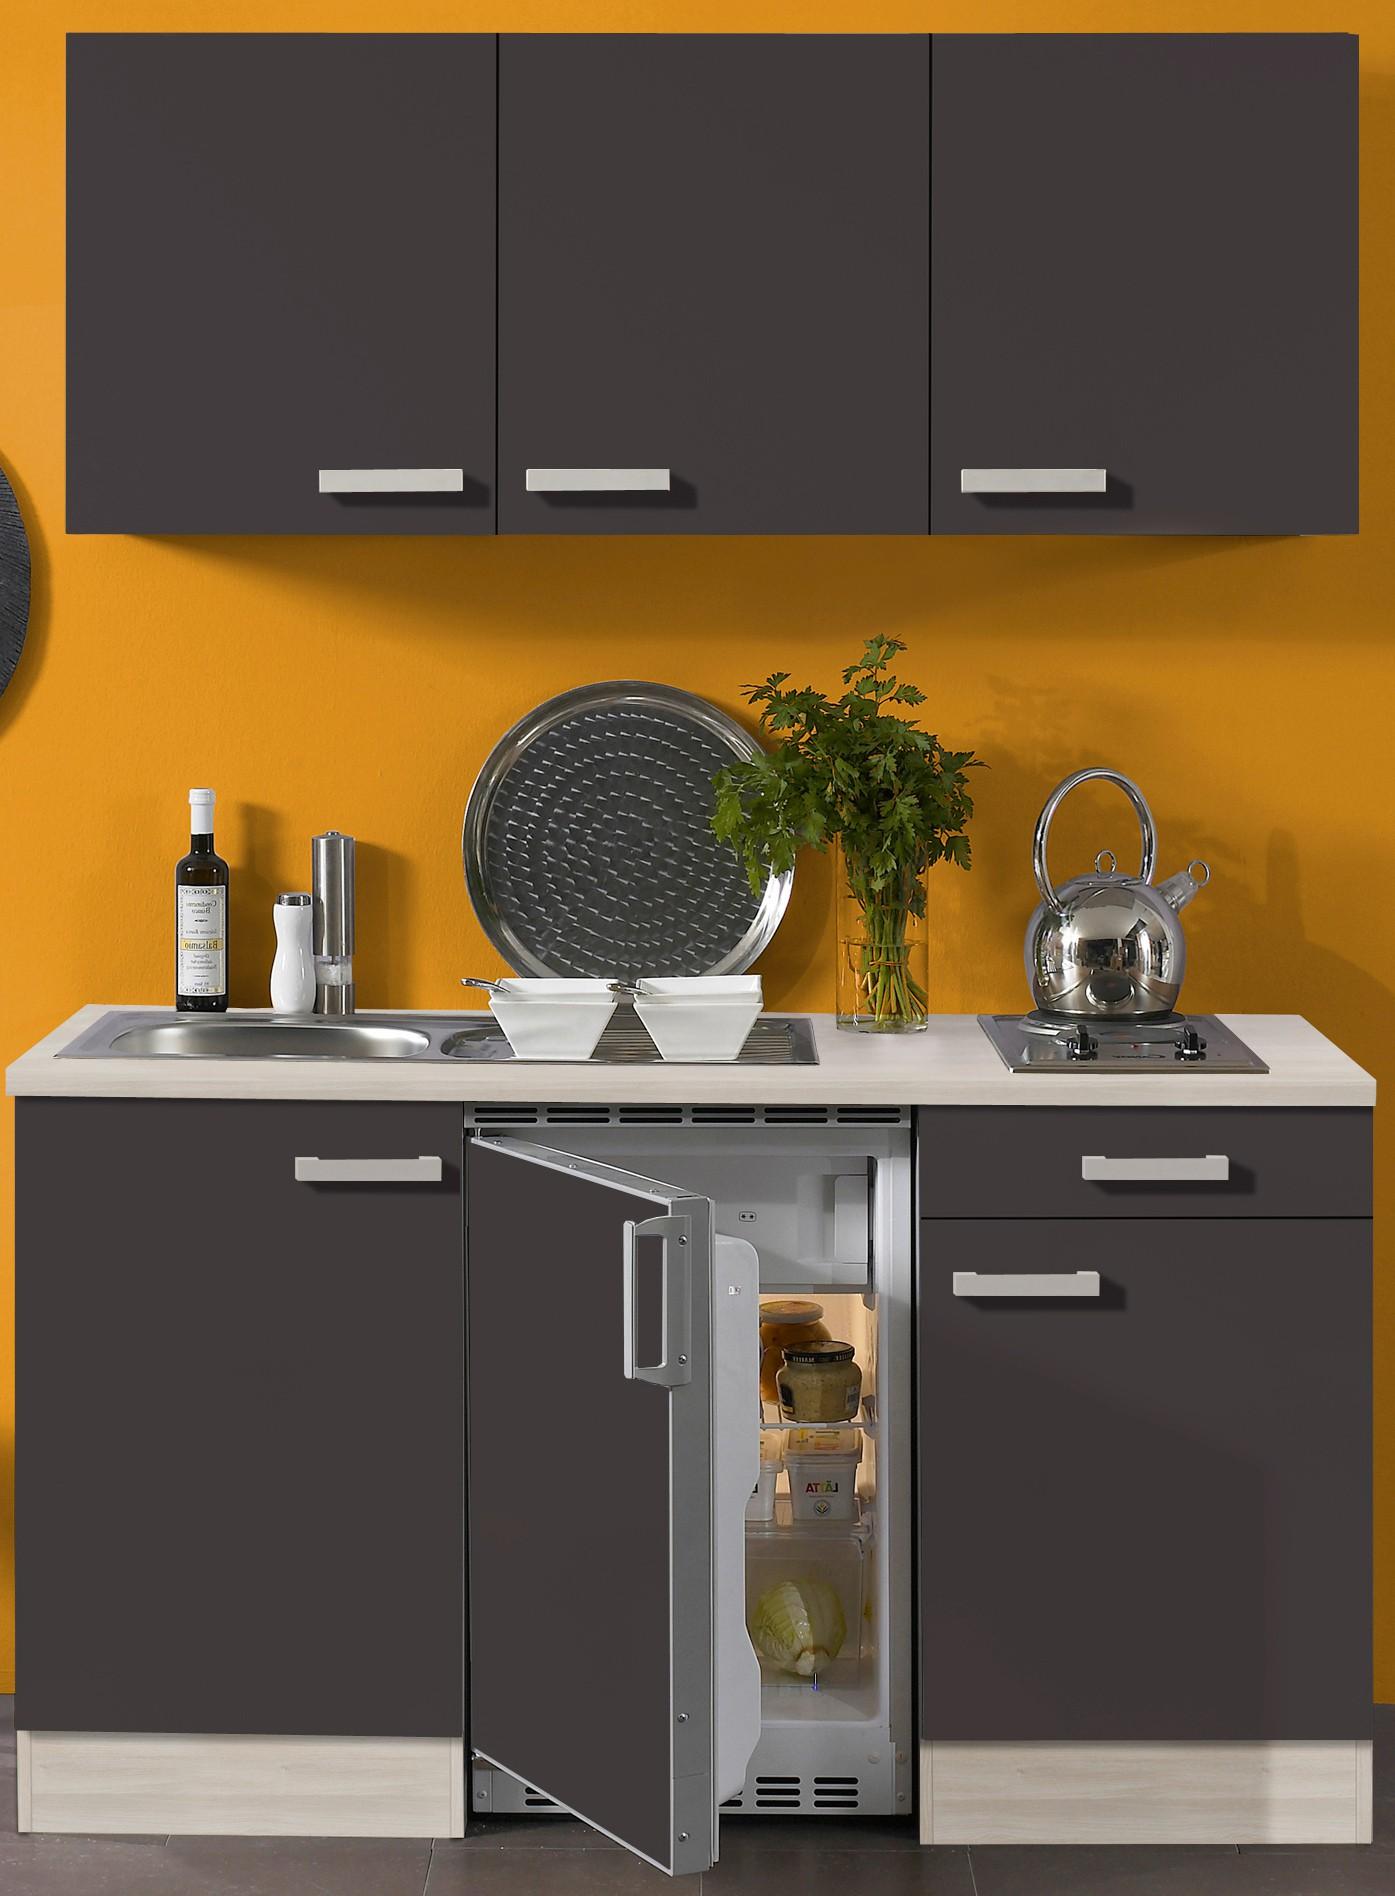 singlek che barcelona mit elektro kochfeld 8 teilig breite 150 cm grau k che singlek chen. Black Bedroom Furniture Sets. Home Design Ideas